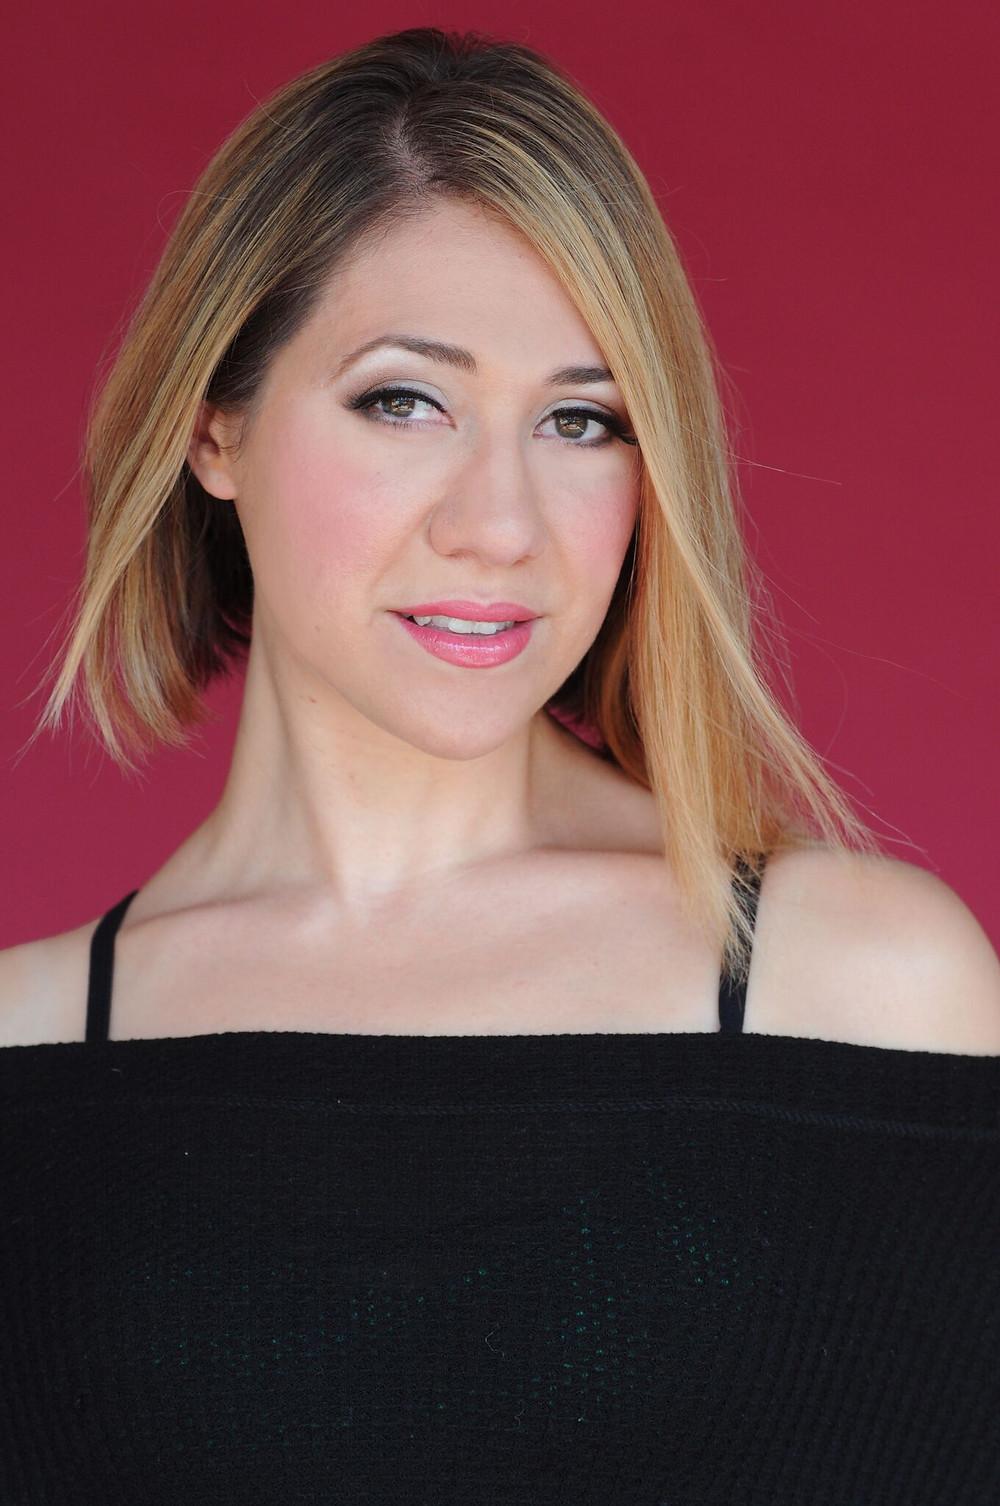 Heather Aued of Bellydance Evolution. Photo Credit: Guy Viau